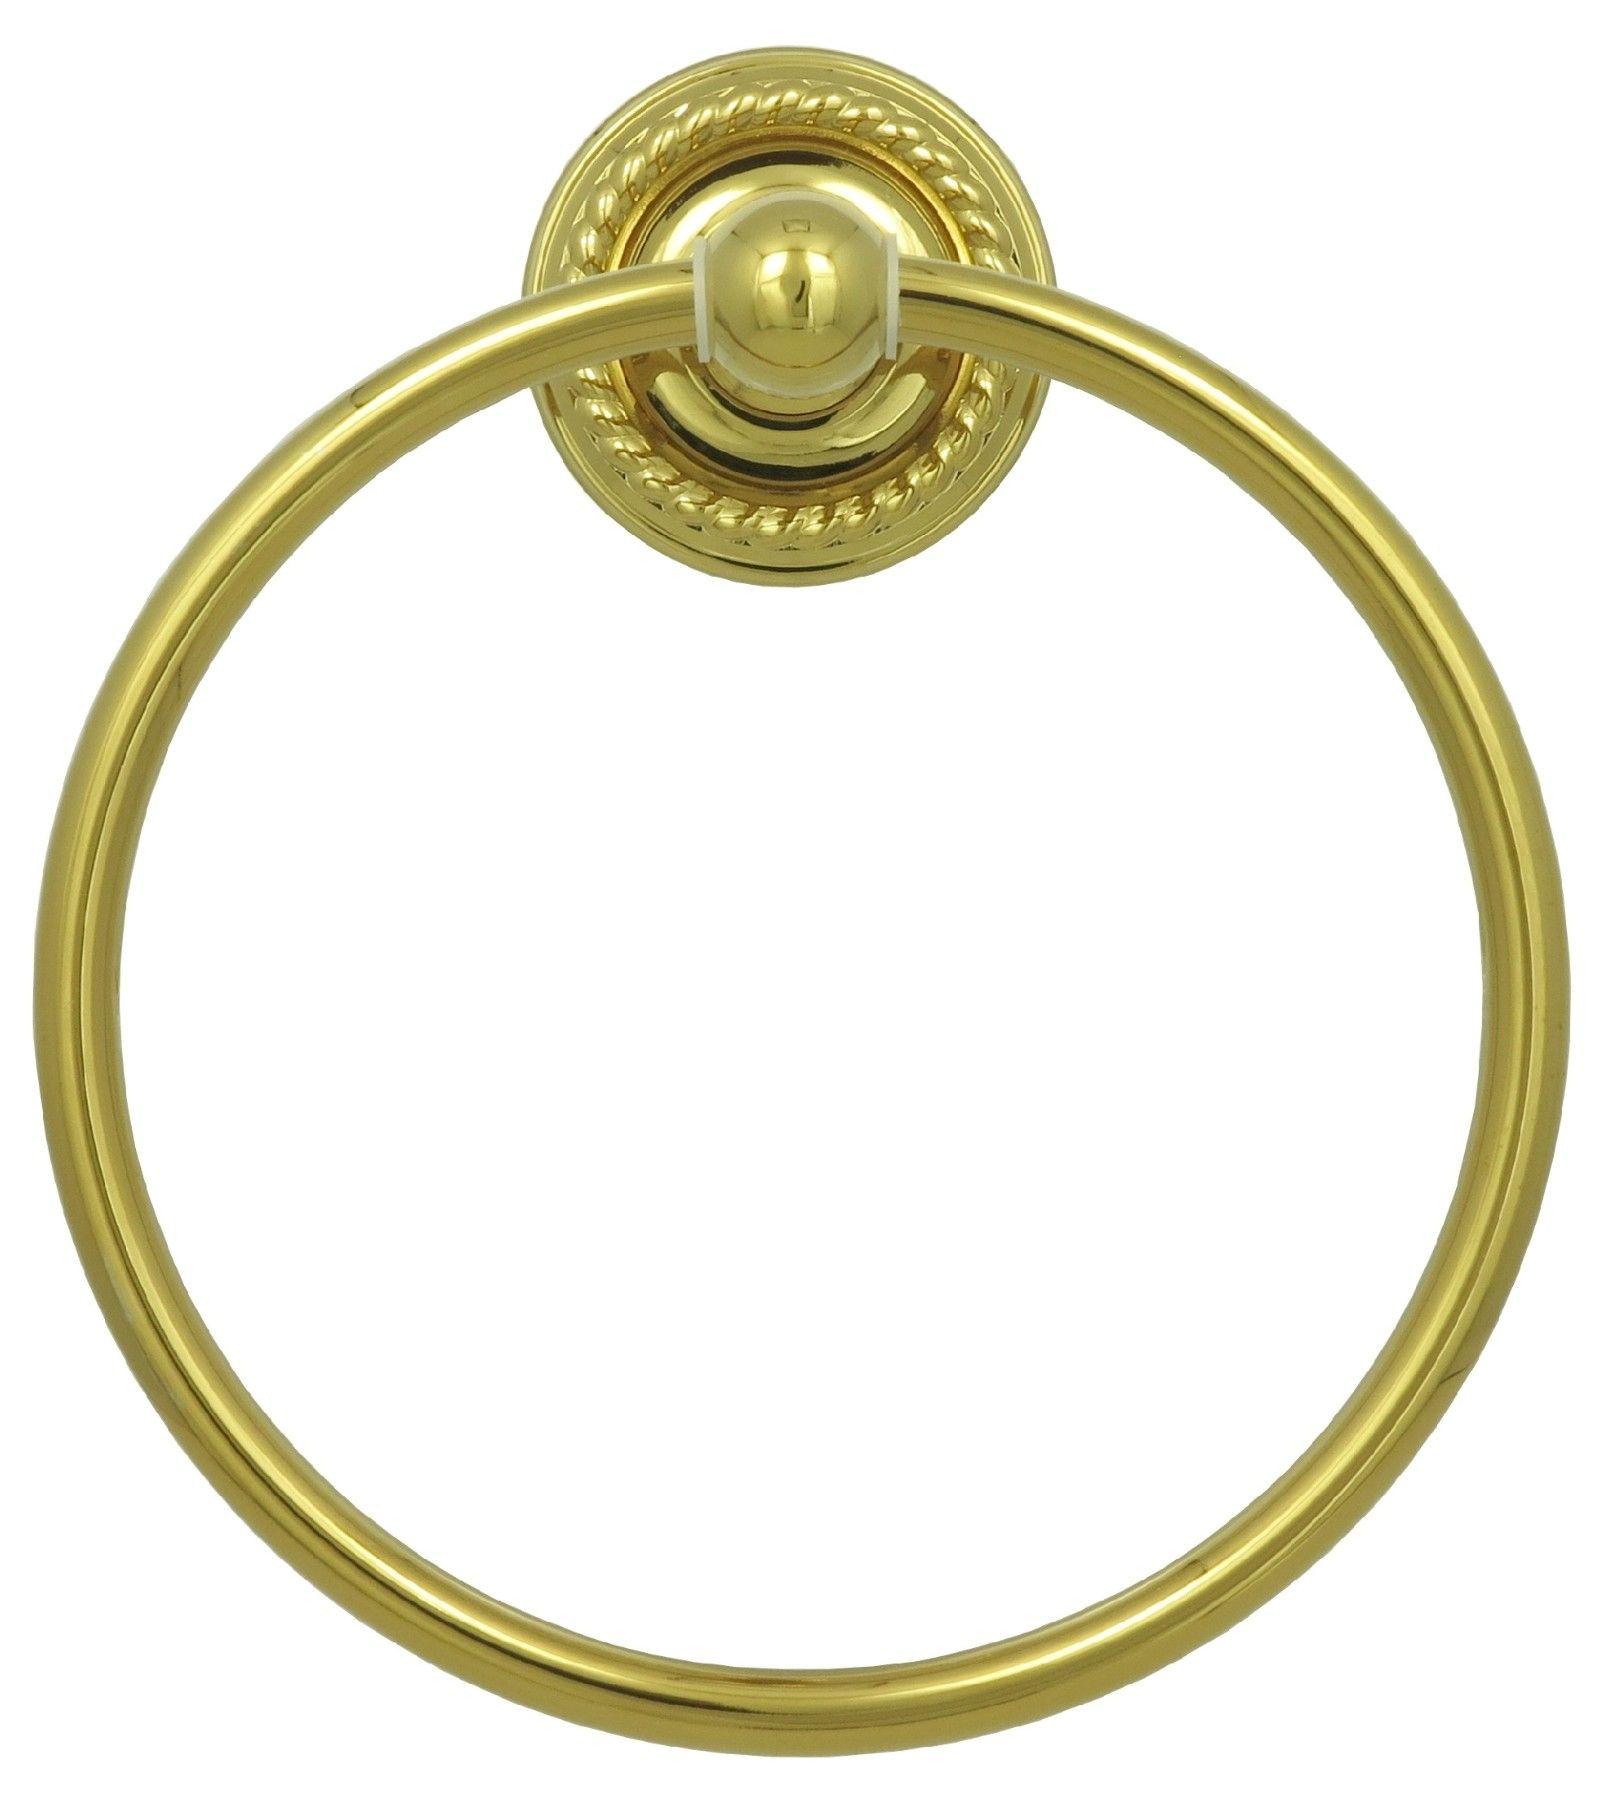 Vintage Handtuchring Retro Handtuchhalter Ring in Gold